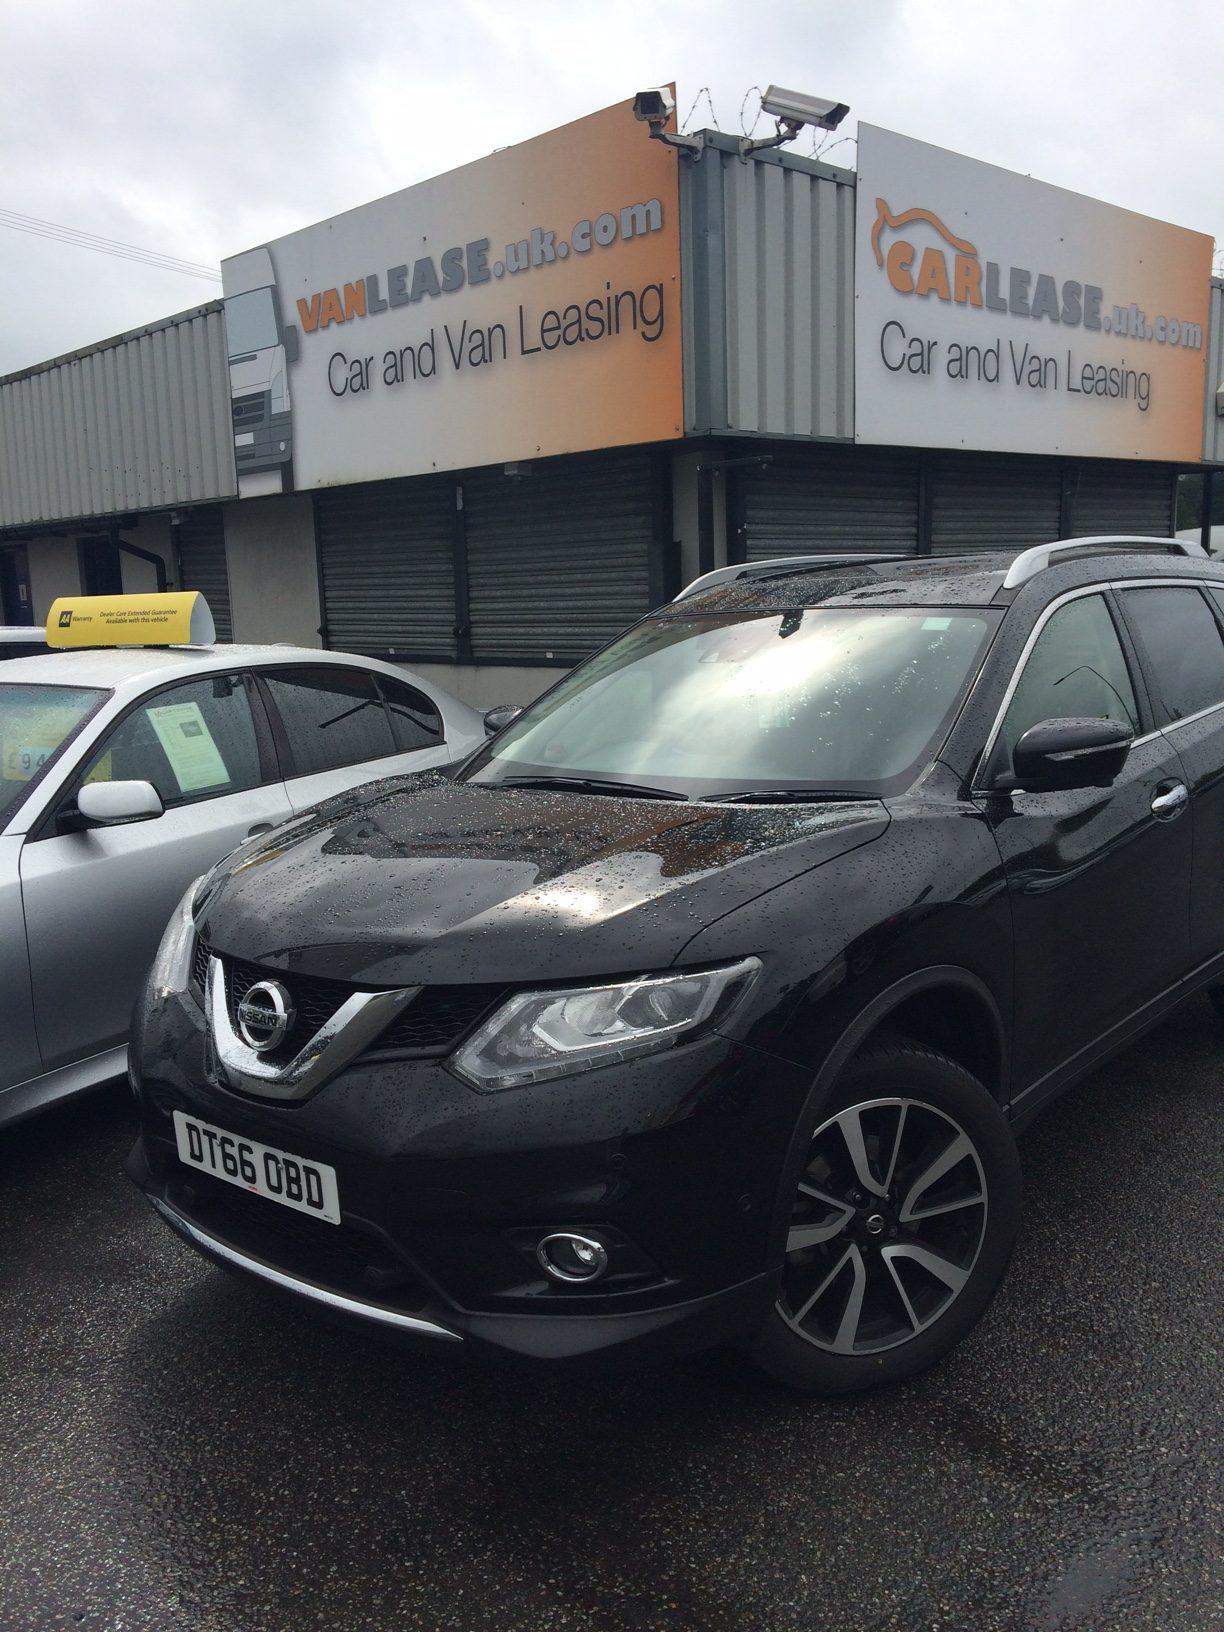 Nissan X-TRAIL DIESEL STATION WAGON 1.6 dCi Tekna 5dr [7 Seat] Manual Car Leasing UK